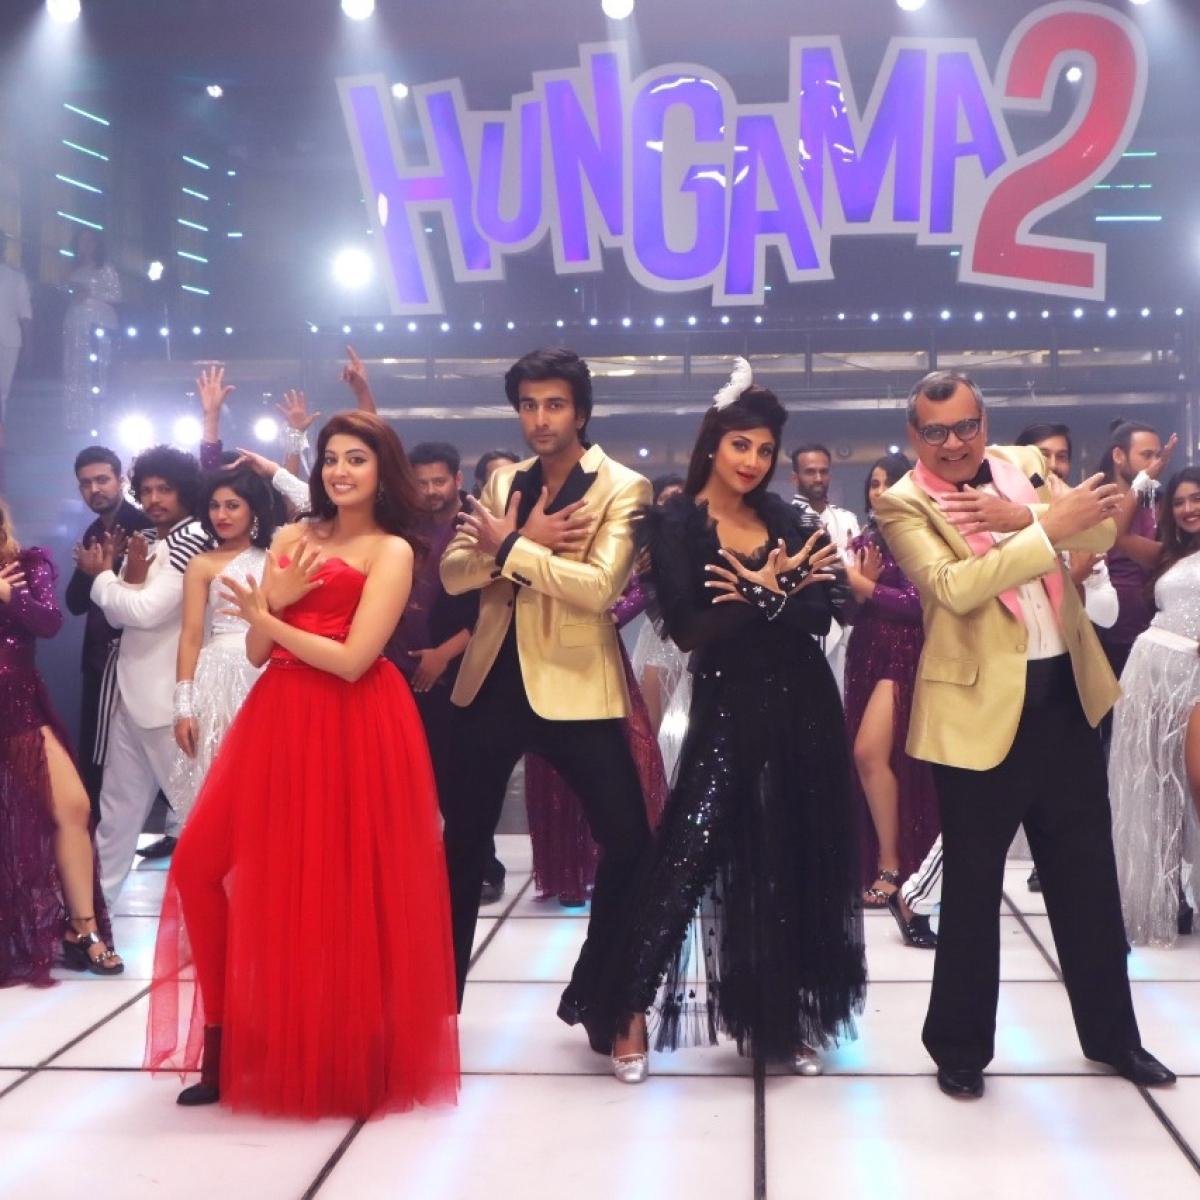 Lights, Camera and Hungama: Paresh Rawal, Shilpa Shetty Kundra, Meezaan Jafri shoot for title track of 'Hungama 2'